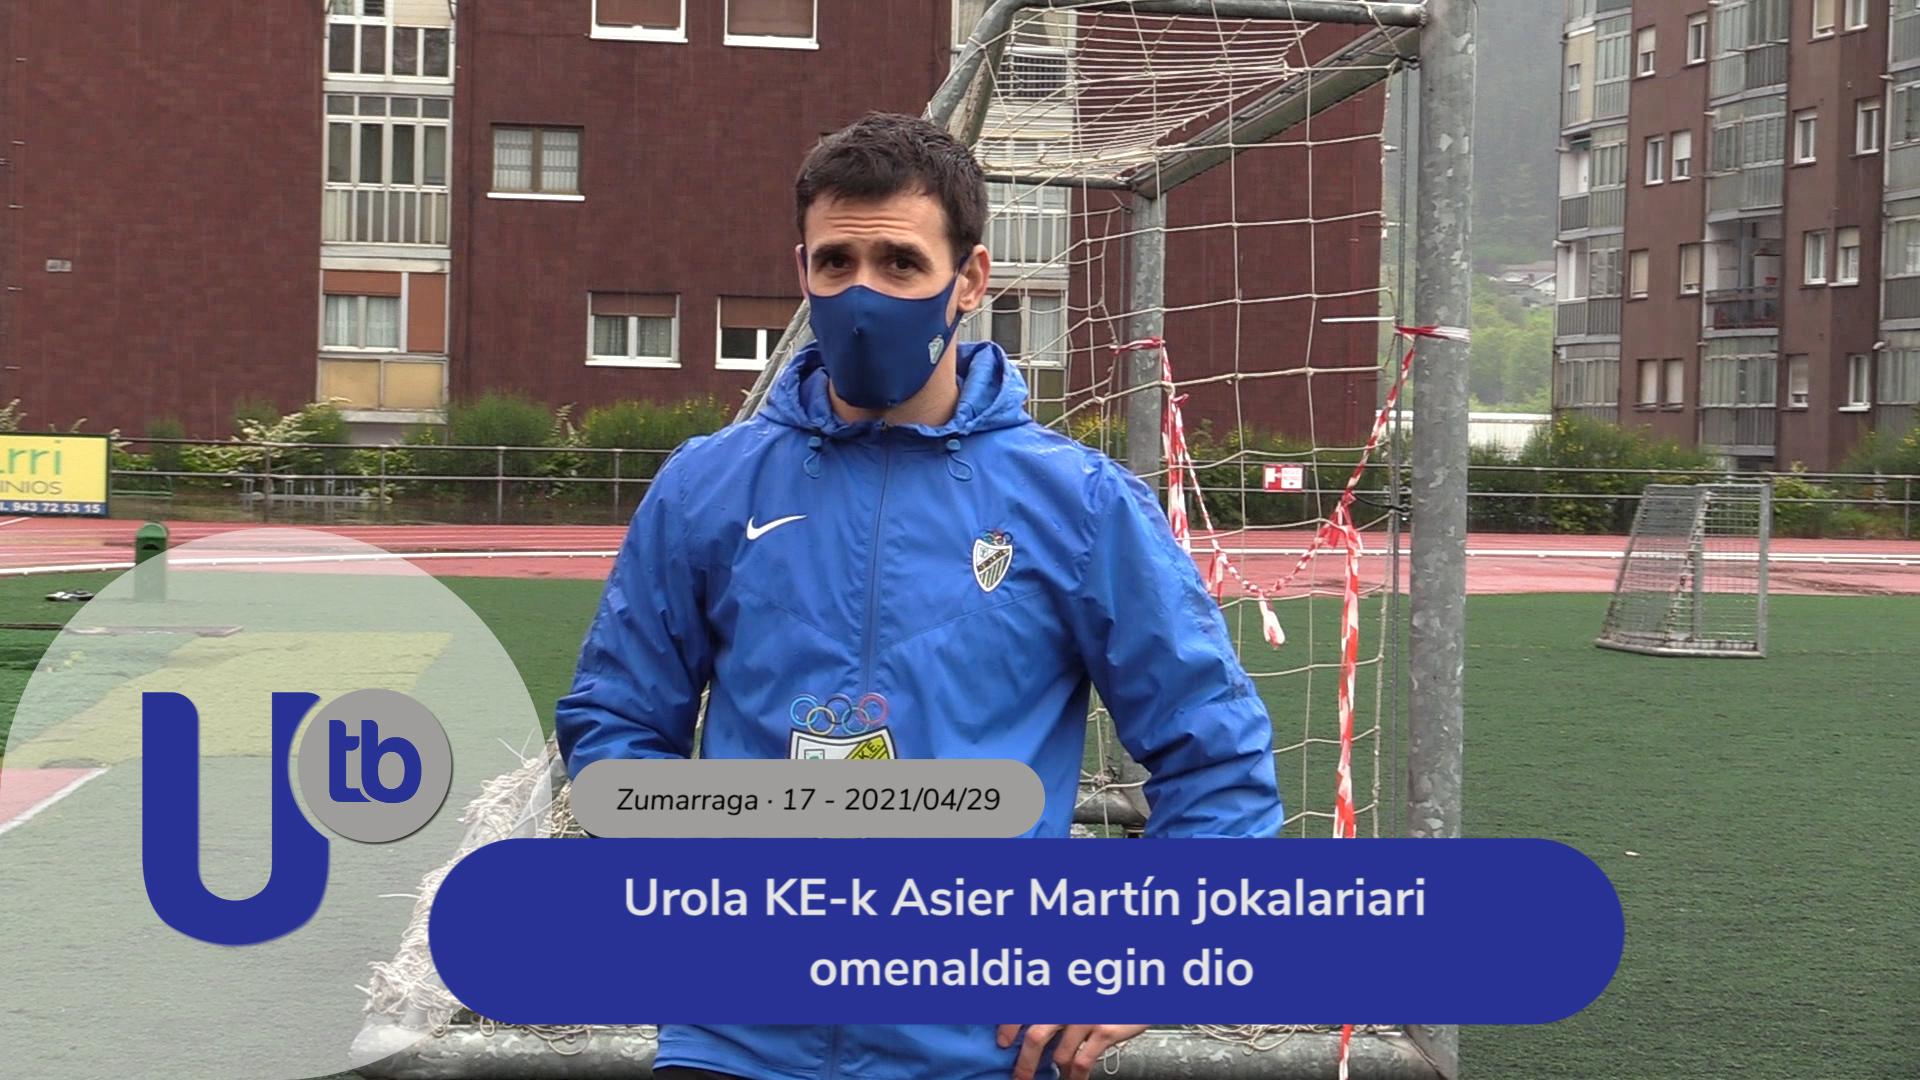 Urola KE-k Asier Martín jokalariari omenaldia egin dio / S.D. Urola homenajea al jugador Asier Martín